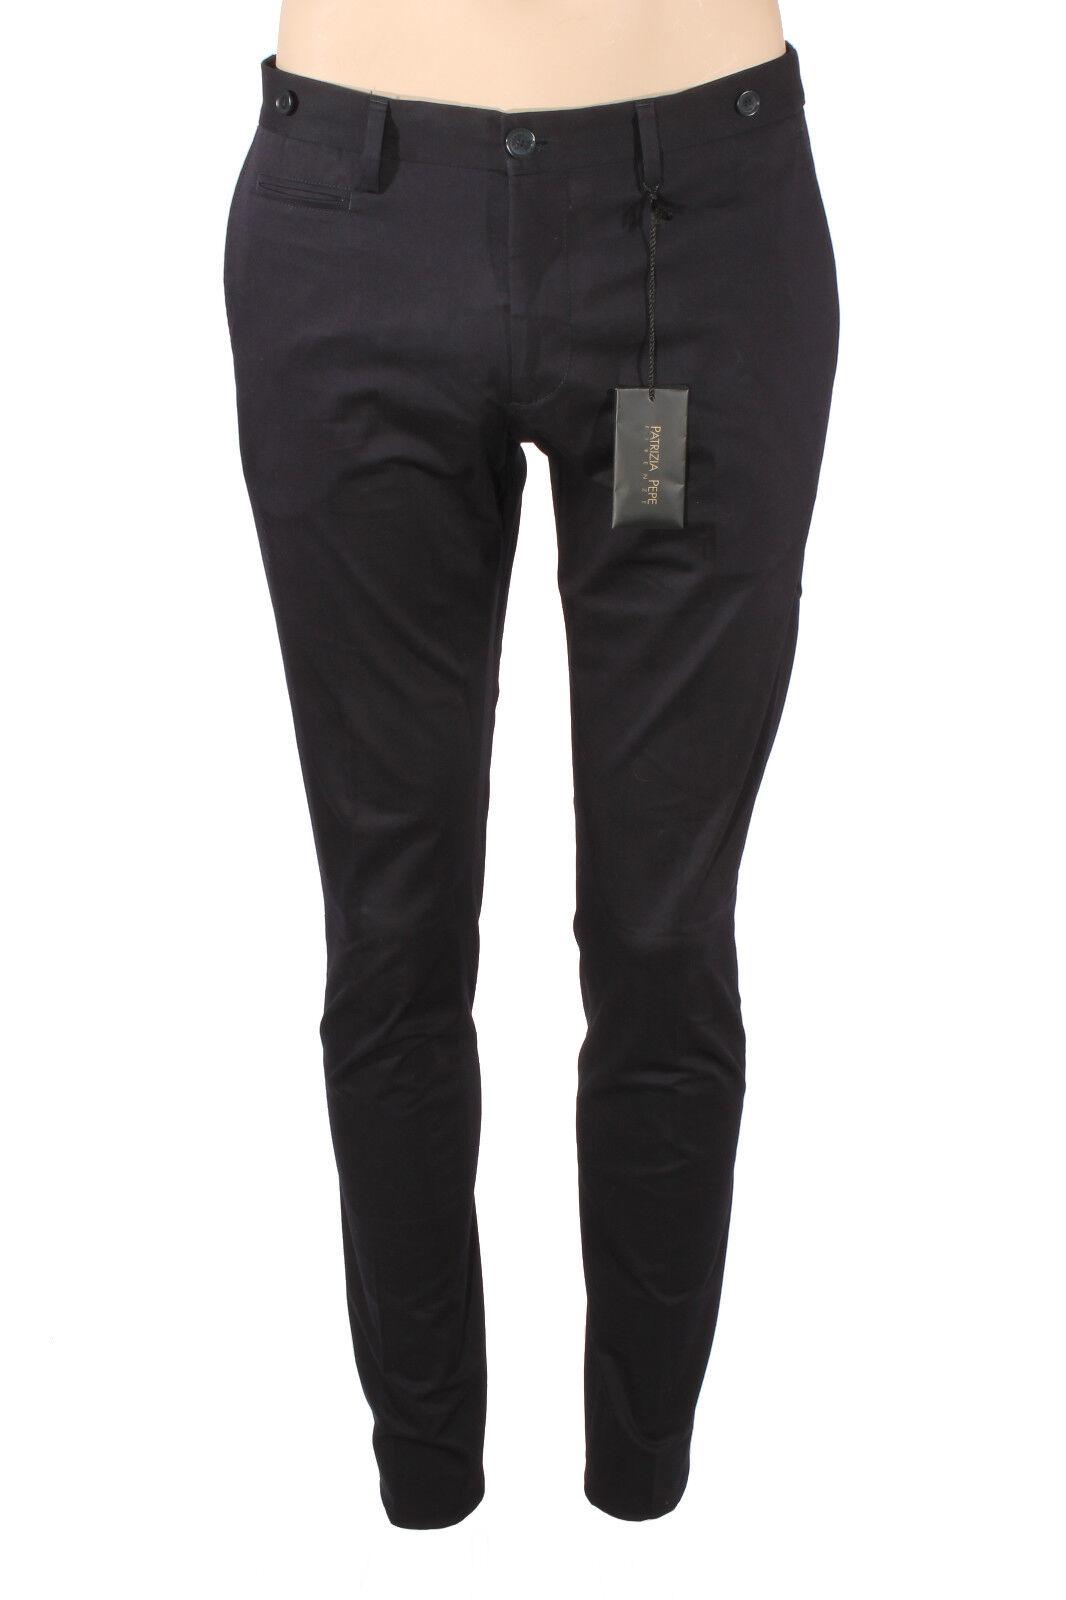 Men's trousers cotton P   E PATRIZIA PEPE Slim Royal navy 5P1225 A424-C166